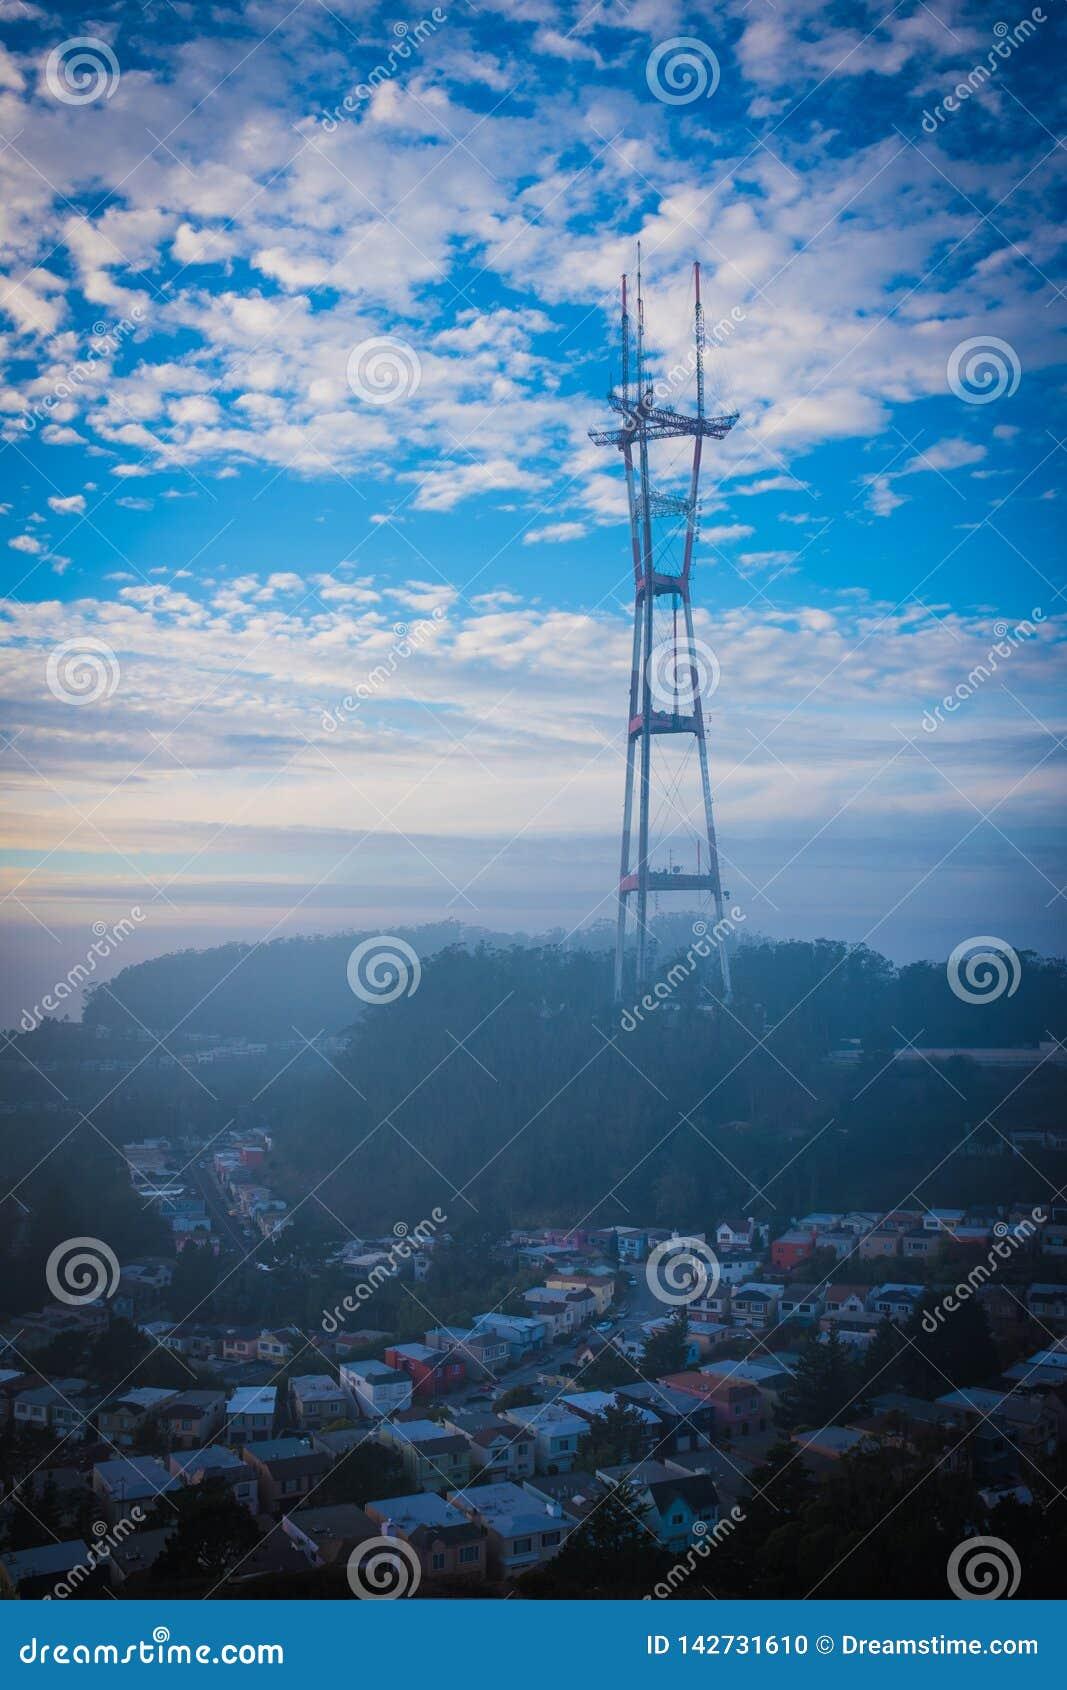 Sutros Kontrollturm, Nachmittag im Herbst, San Francisco